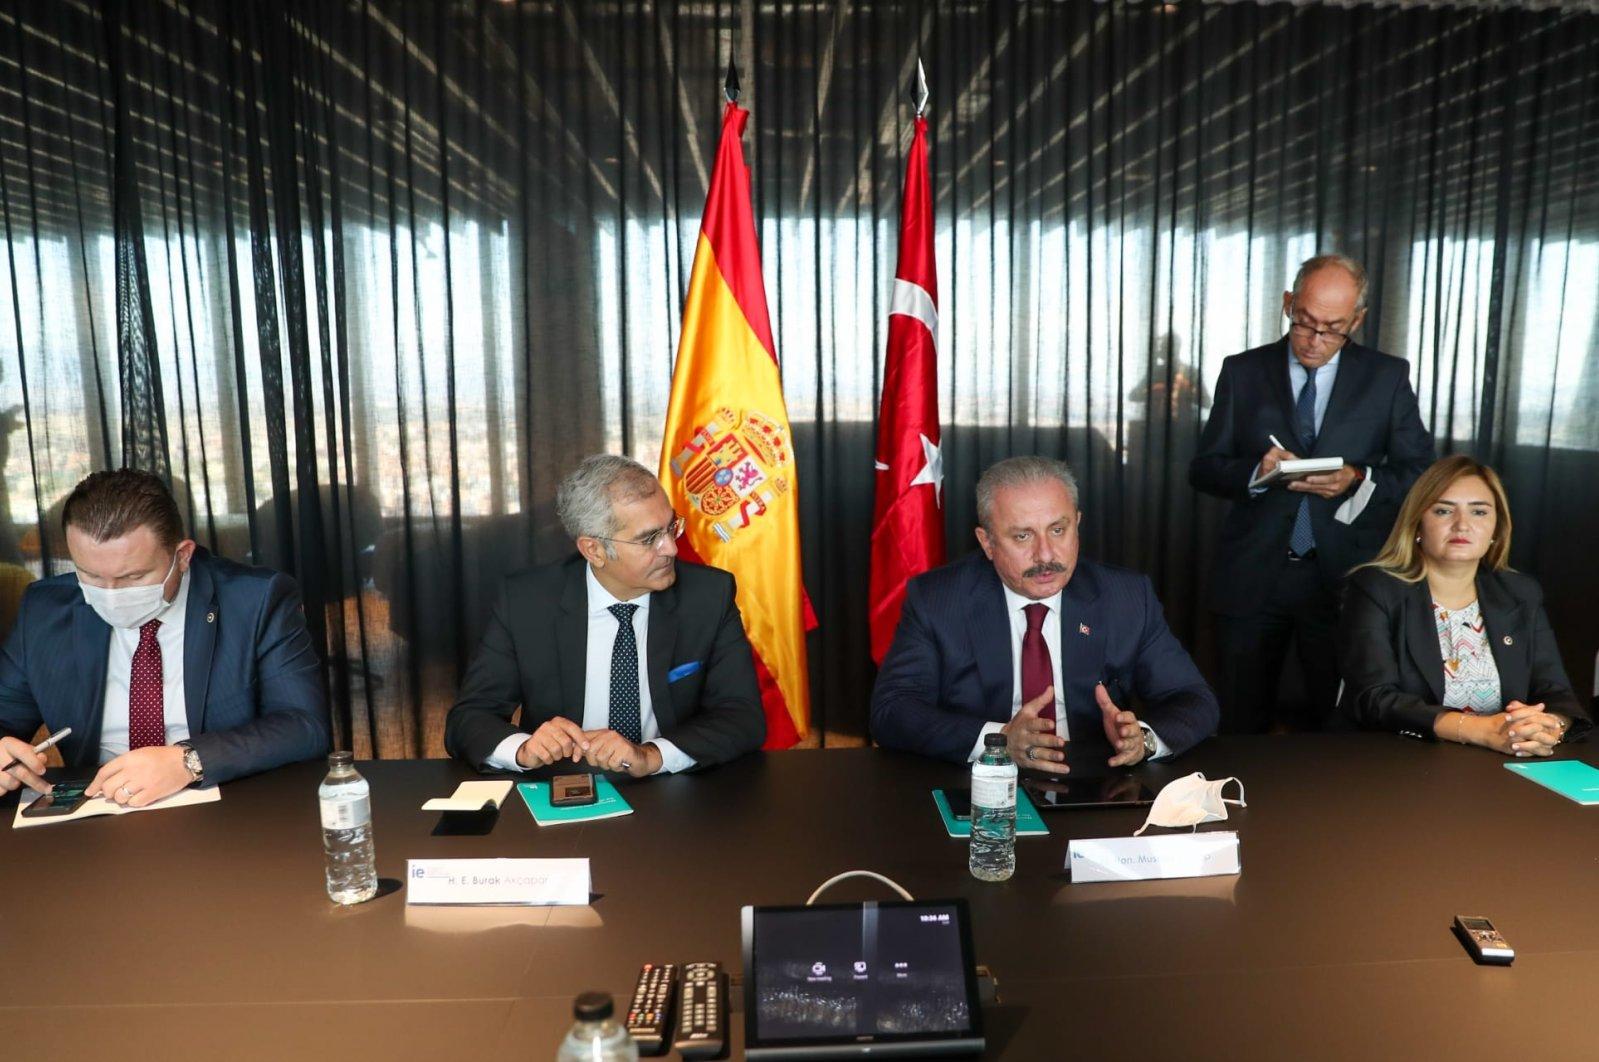 Parliament Speaker Mustafa Şentop visits the Global International Relations Center in Madrid, Spain, Sept. 20, 2021. (AA Photo)